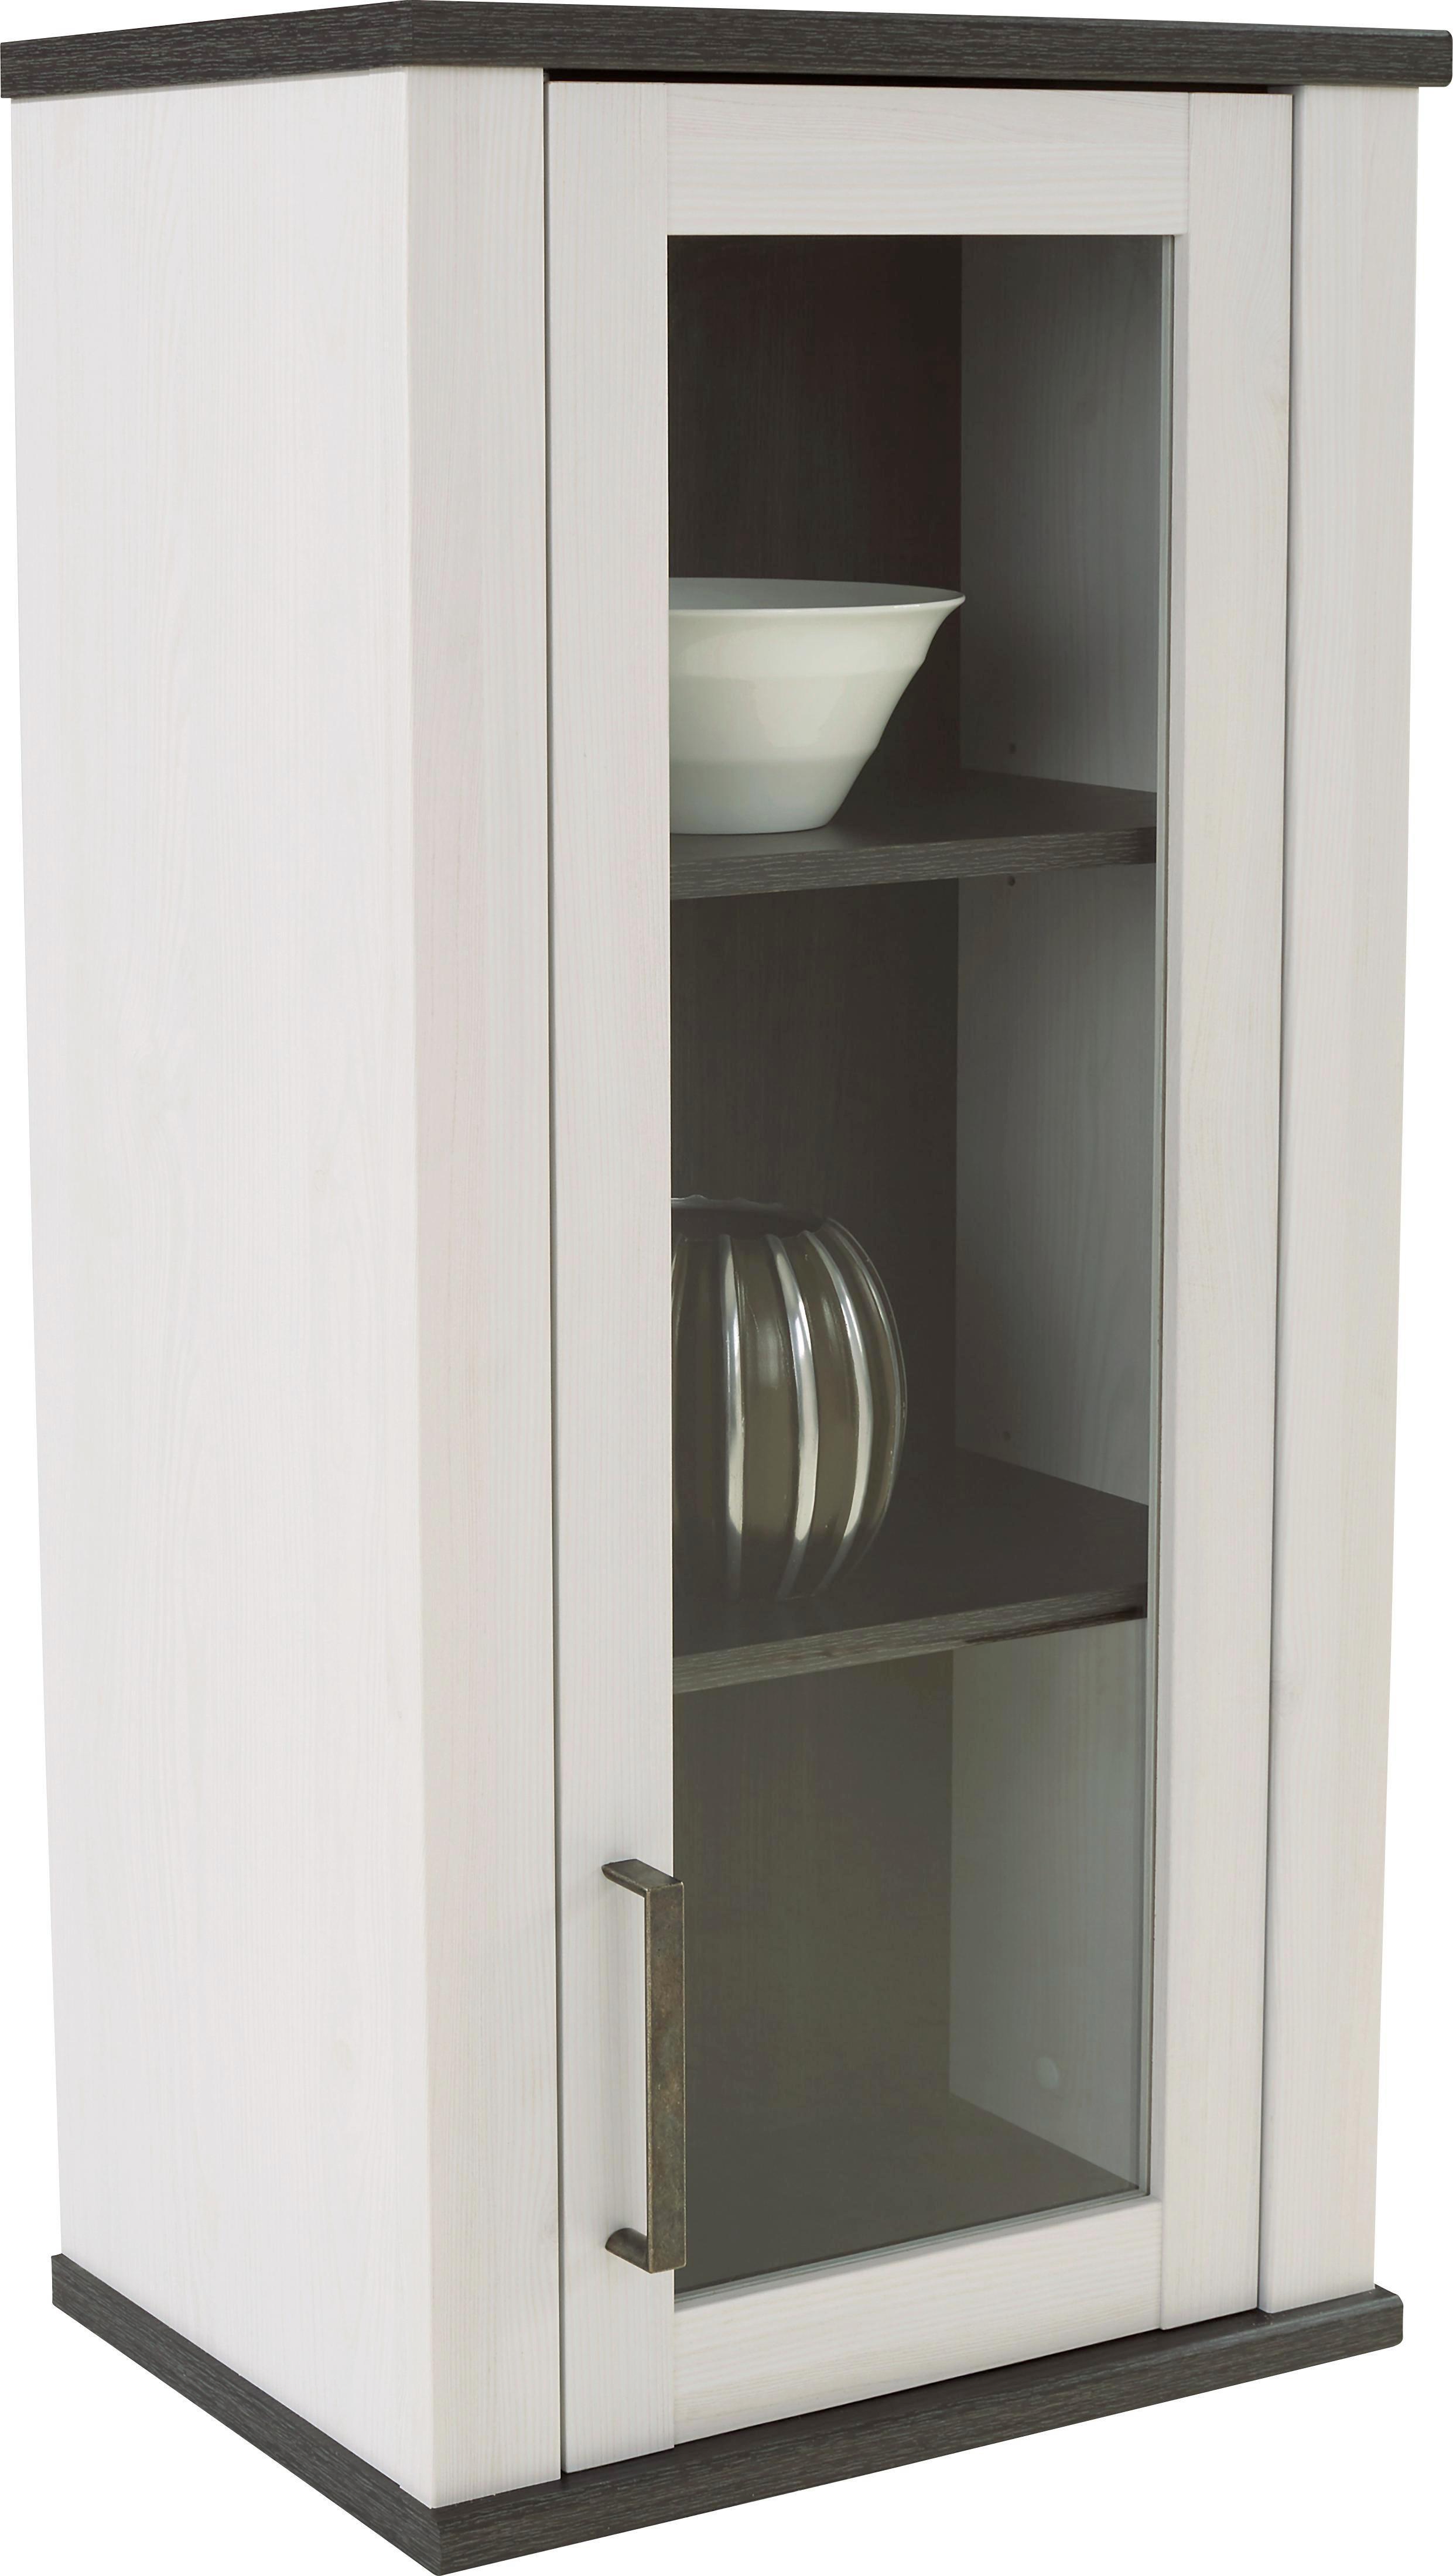 Falivitrin Provence - tiszta/fehér, romantikus/Landhaus, faanyagok (56,8/104/30cm) - JAMES WOOD